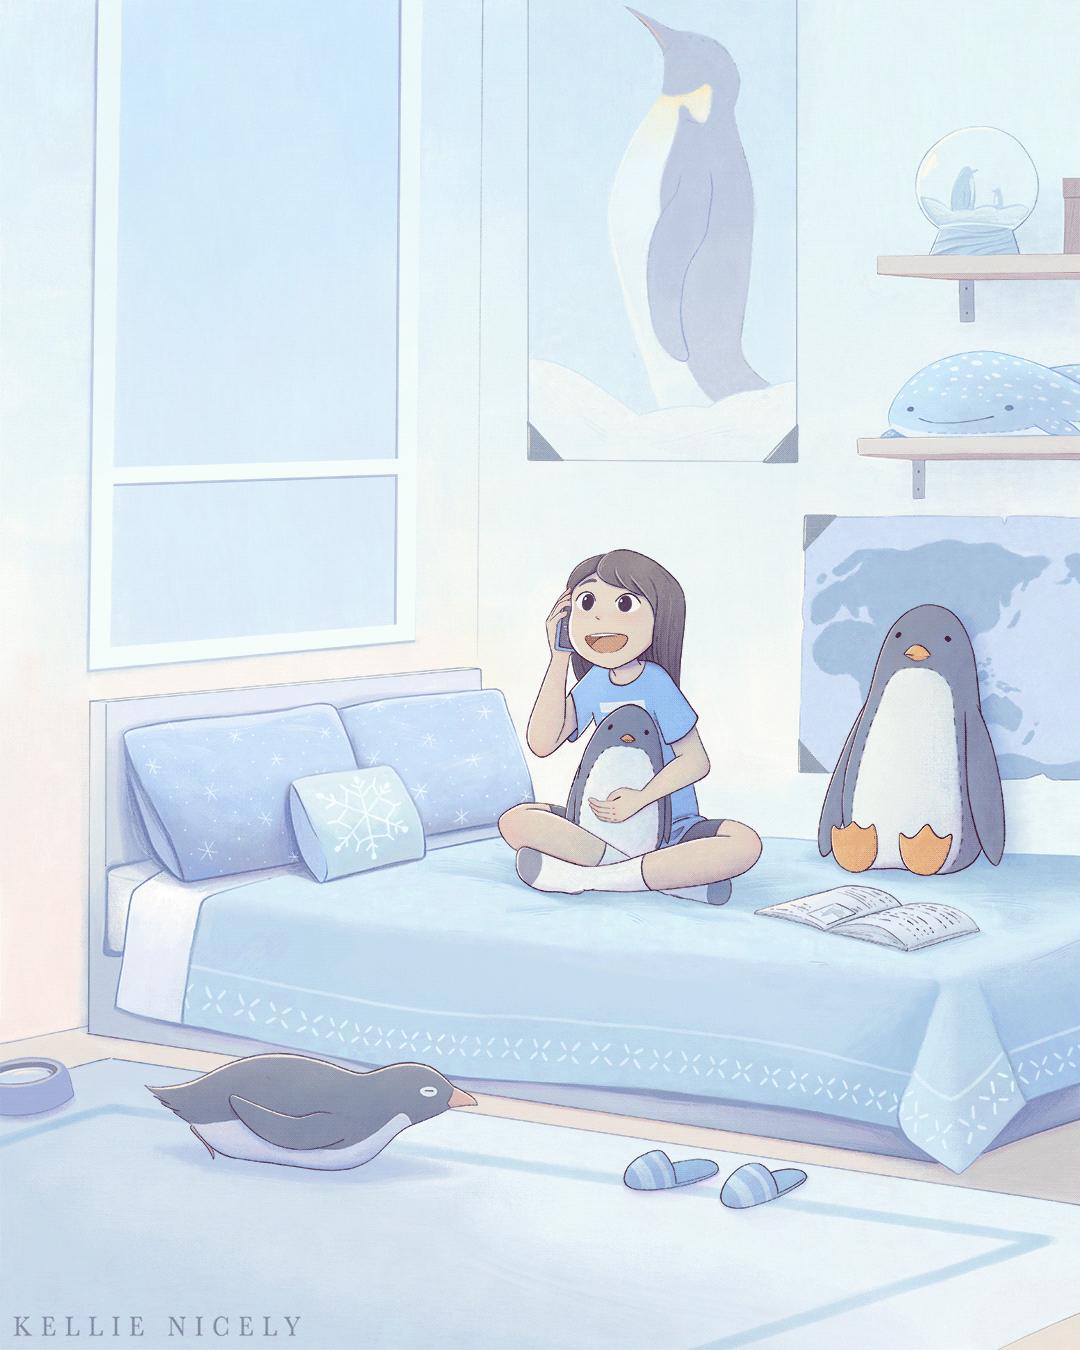 Image may contain: cartoon, bed and drawing